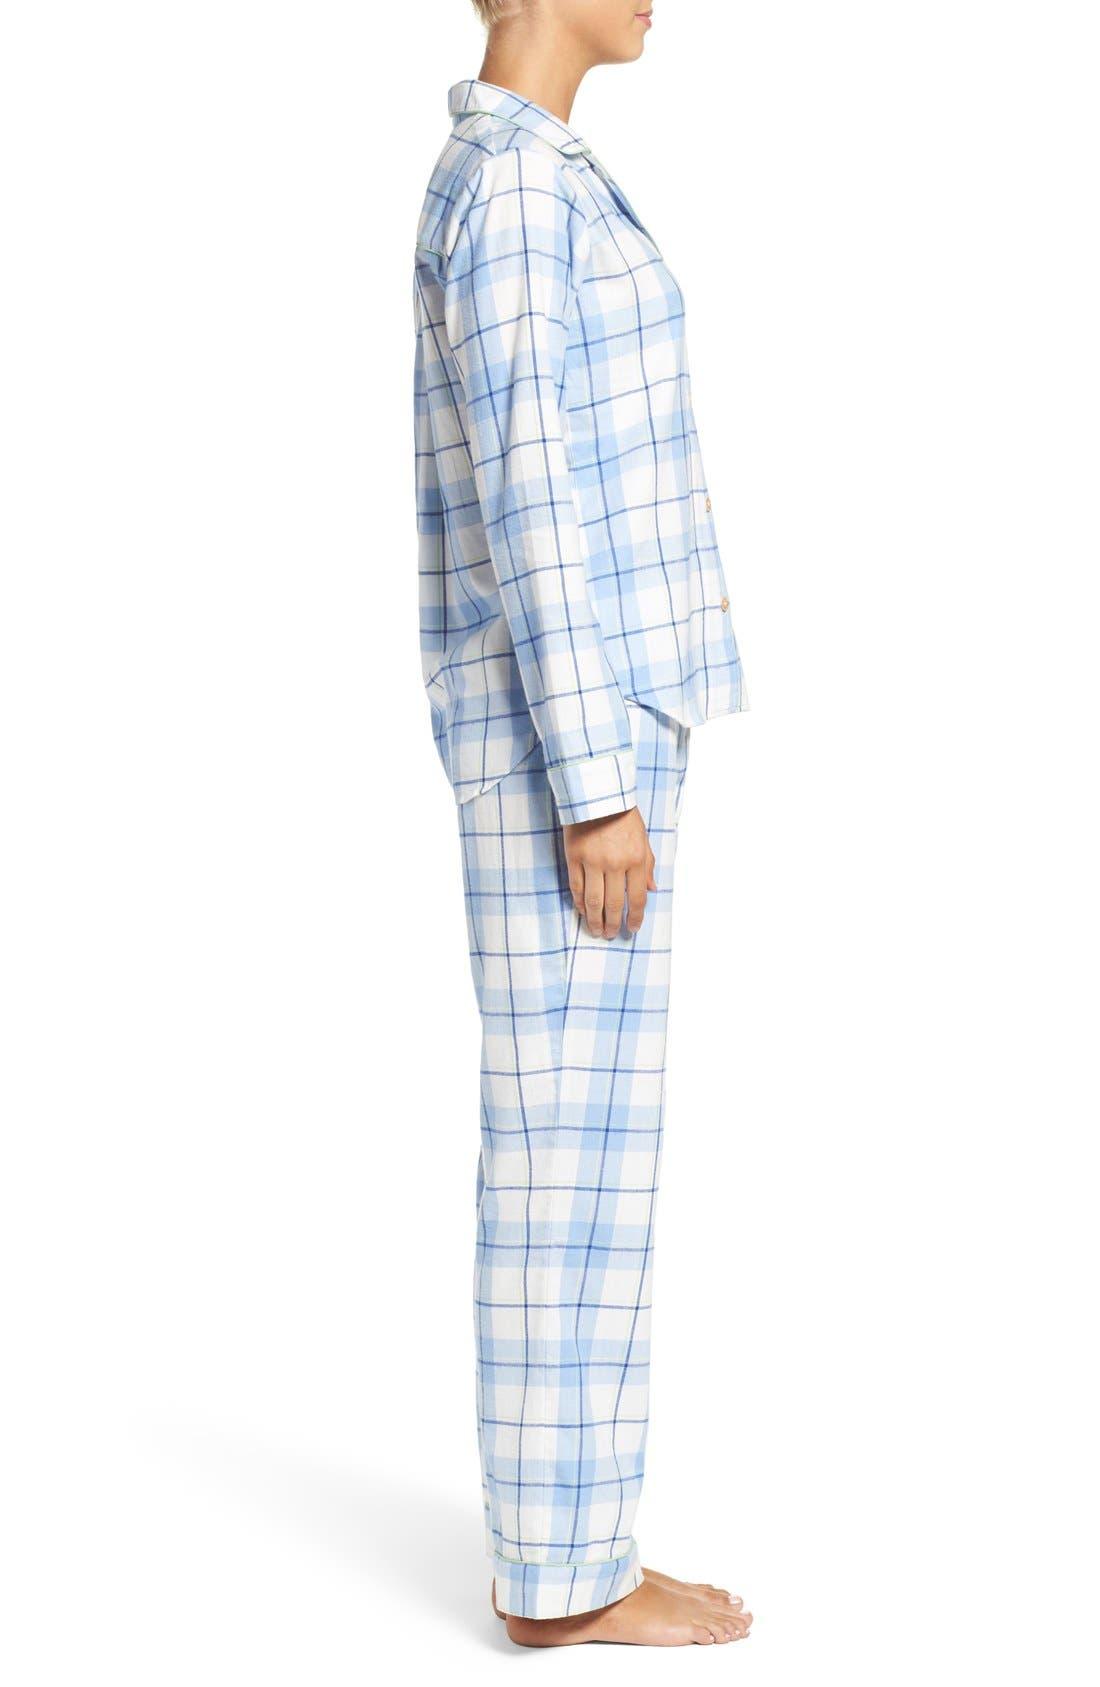 'Raven' Plaid Cotton Pajamas,                             Alternate thumbnail 2, color,                             410